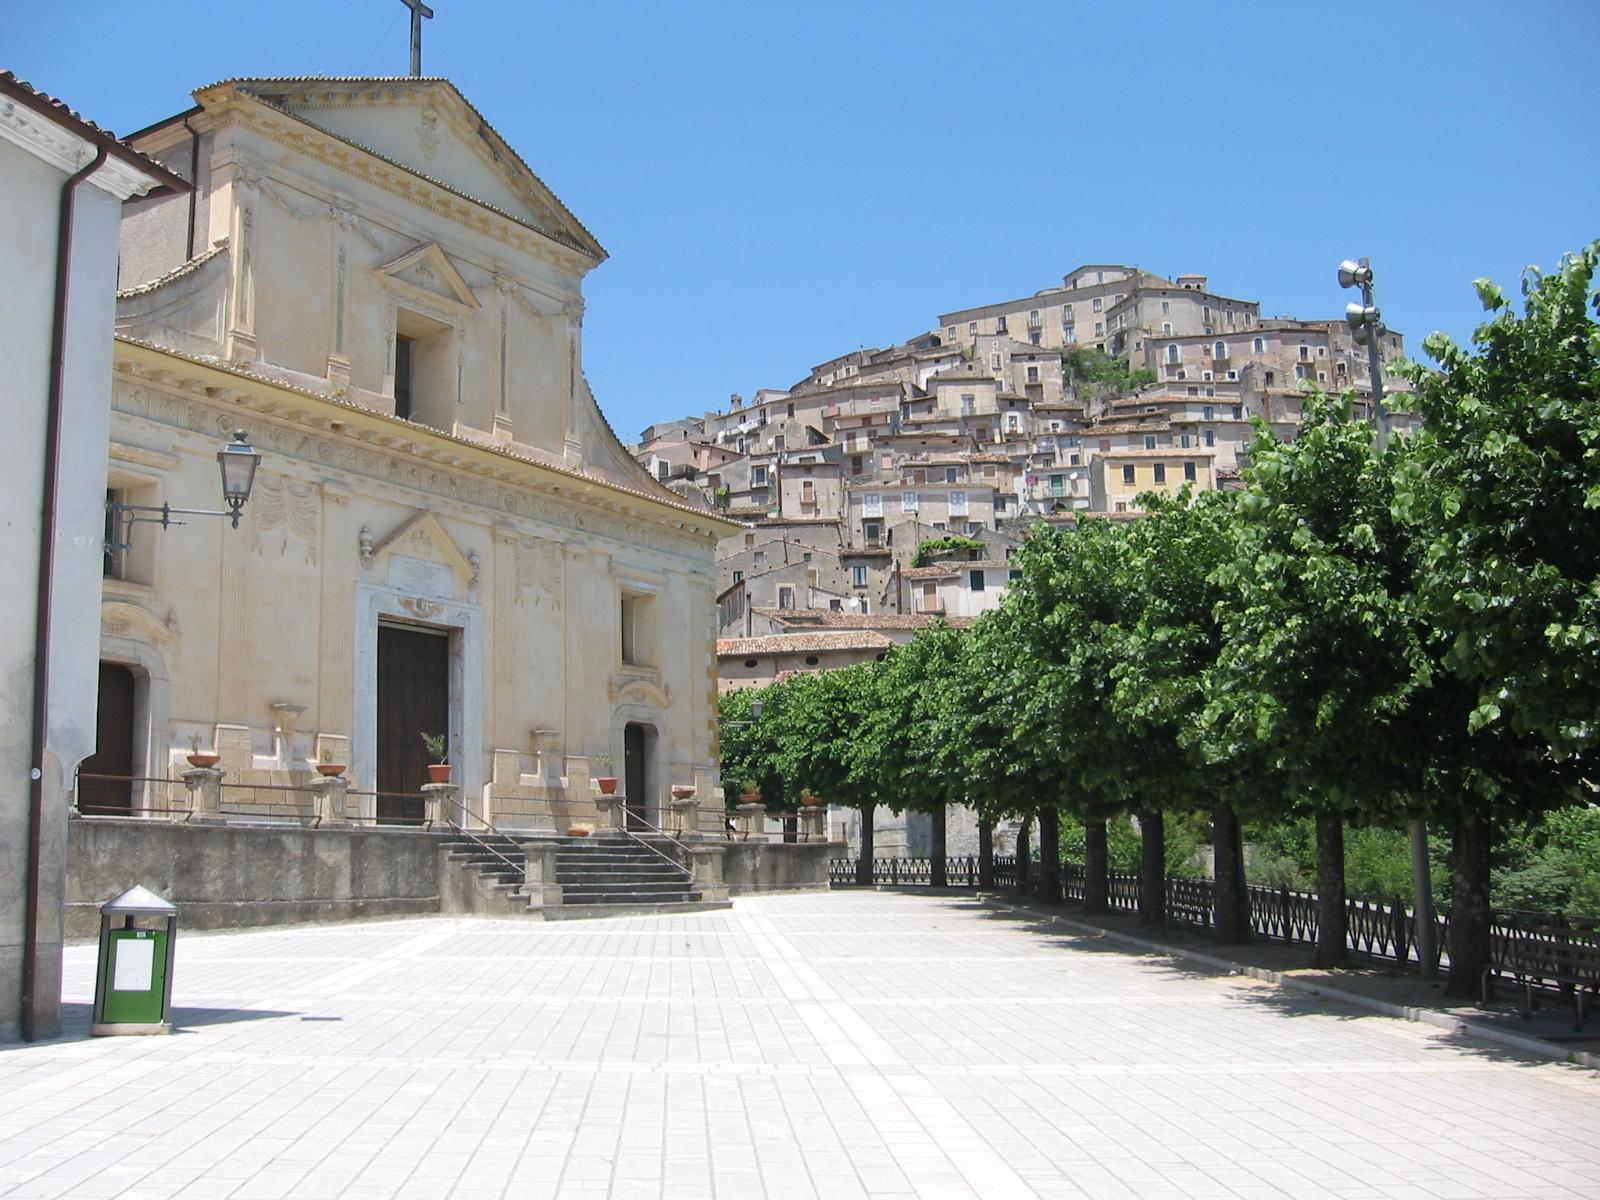 Sicilie en andere tips van rianne plitscher: 2009 calabrie en puglia